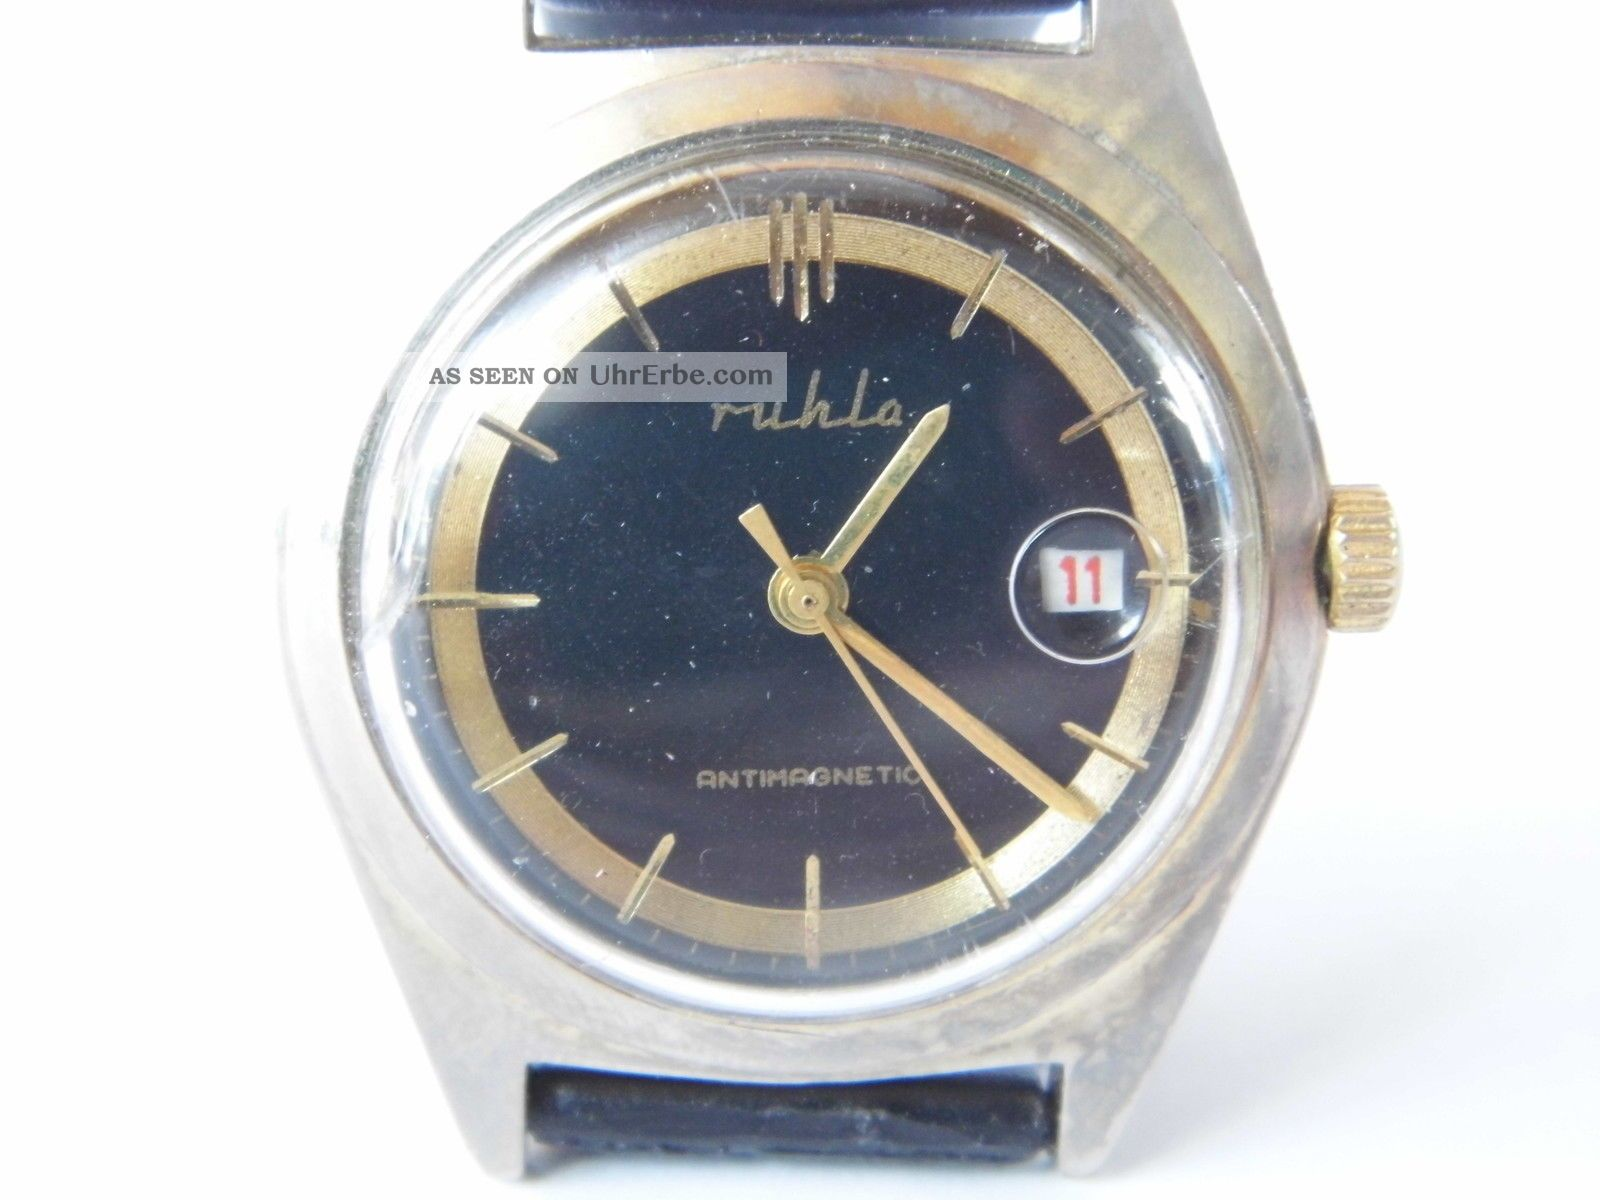 Herrenuhr Ruhla Date Handaufzug,  Edelstahl,  Läuft Nicht Richtig Armbanduhren Bild